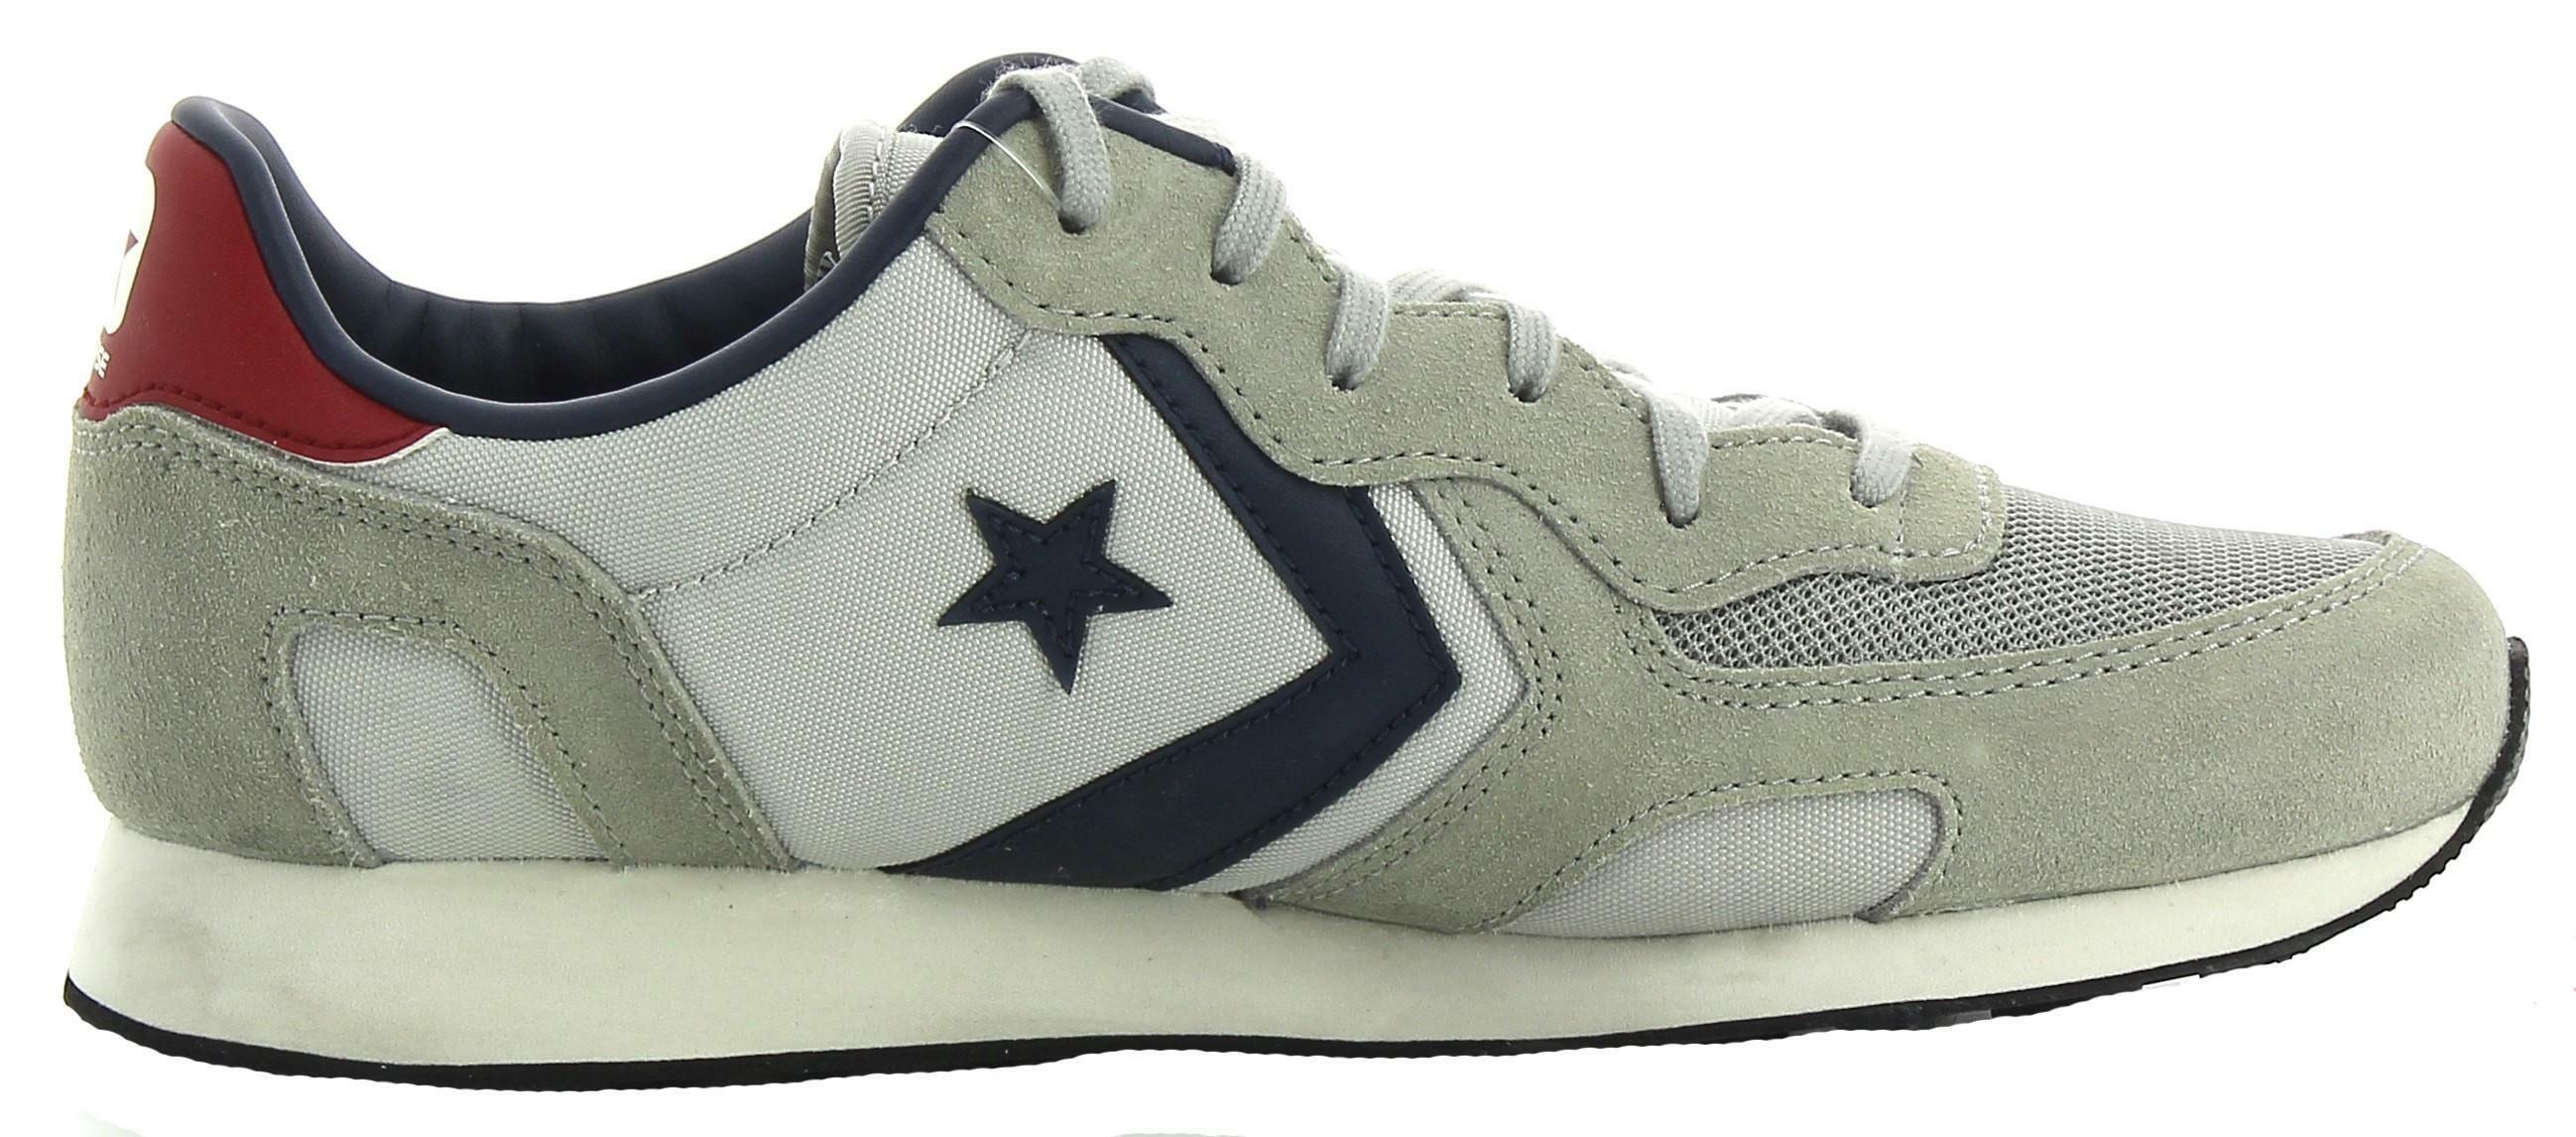 Converse auckland racer distressed ox scarpe sportive uomo grigie